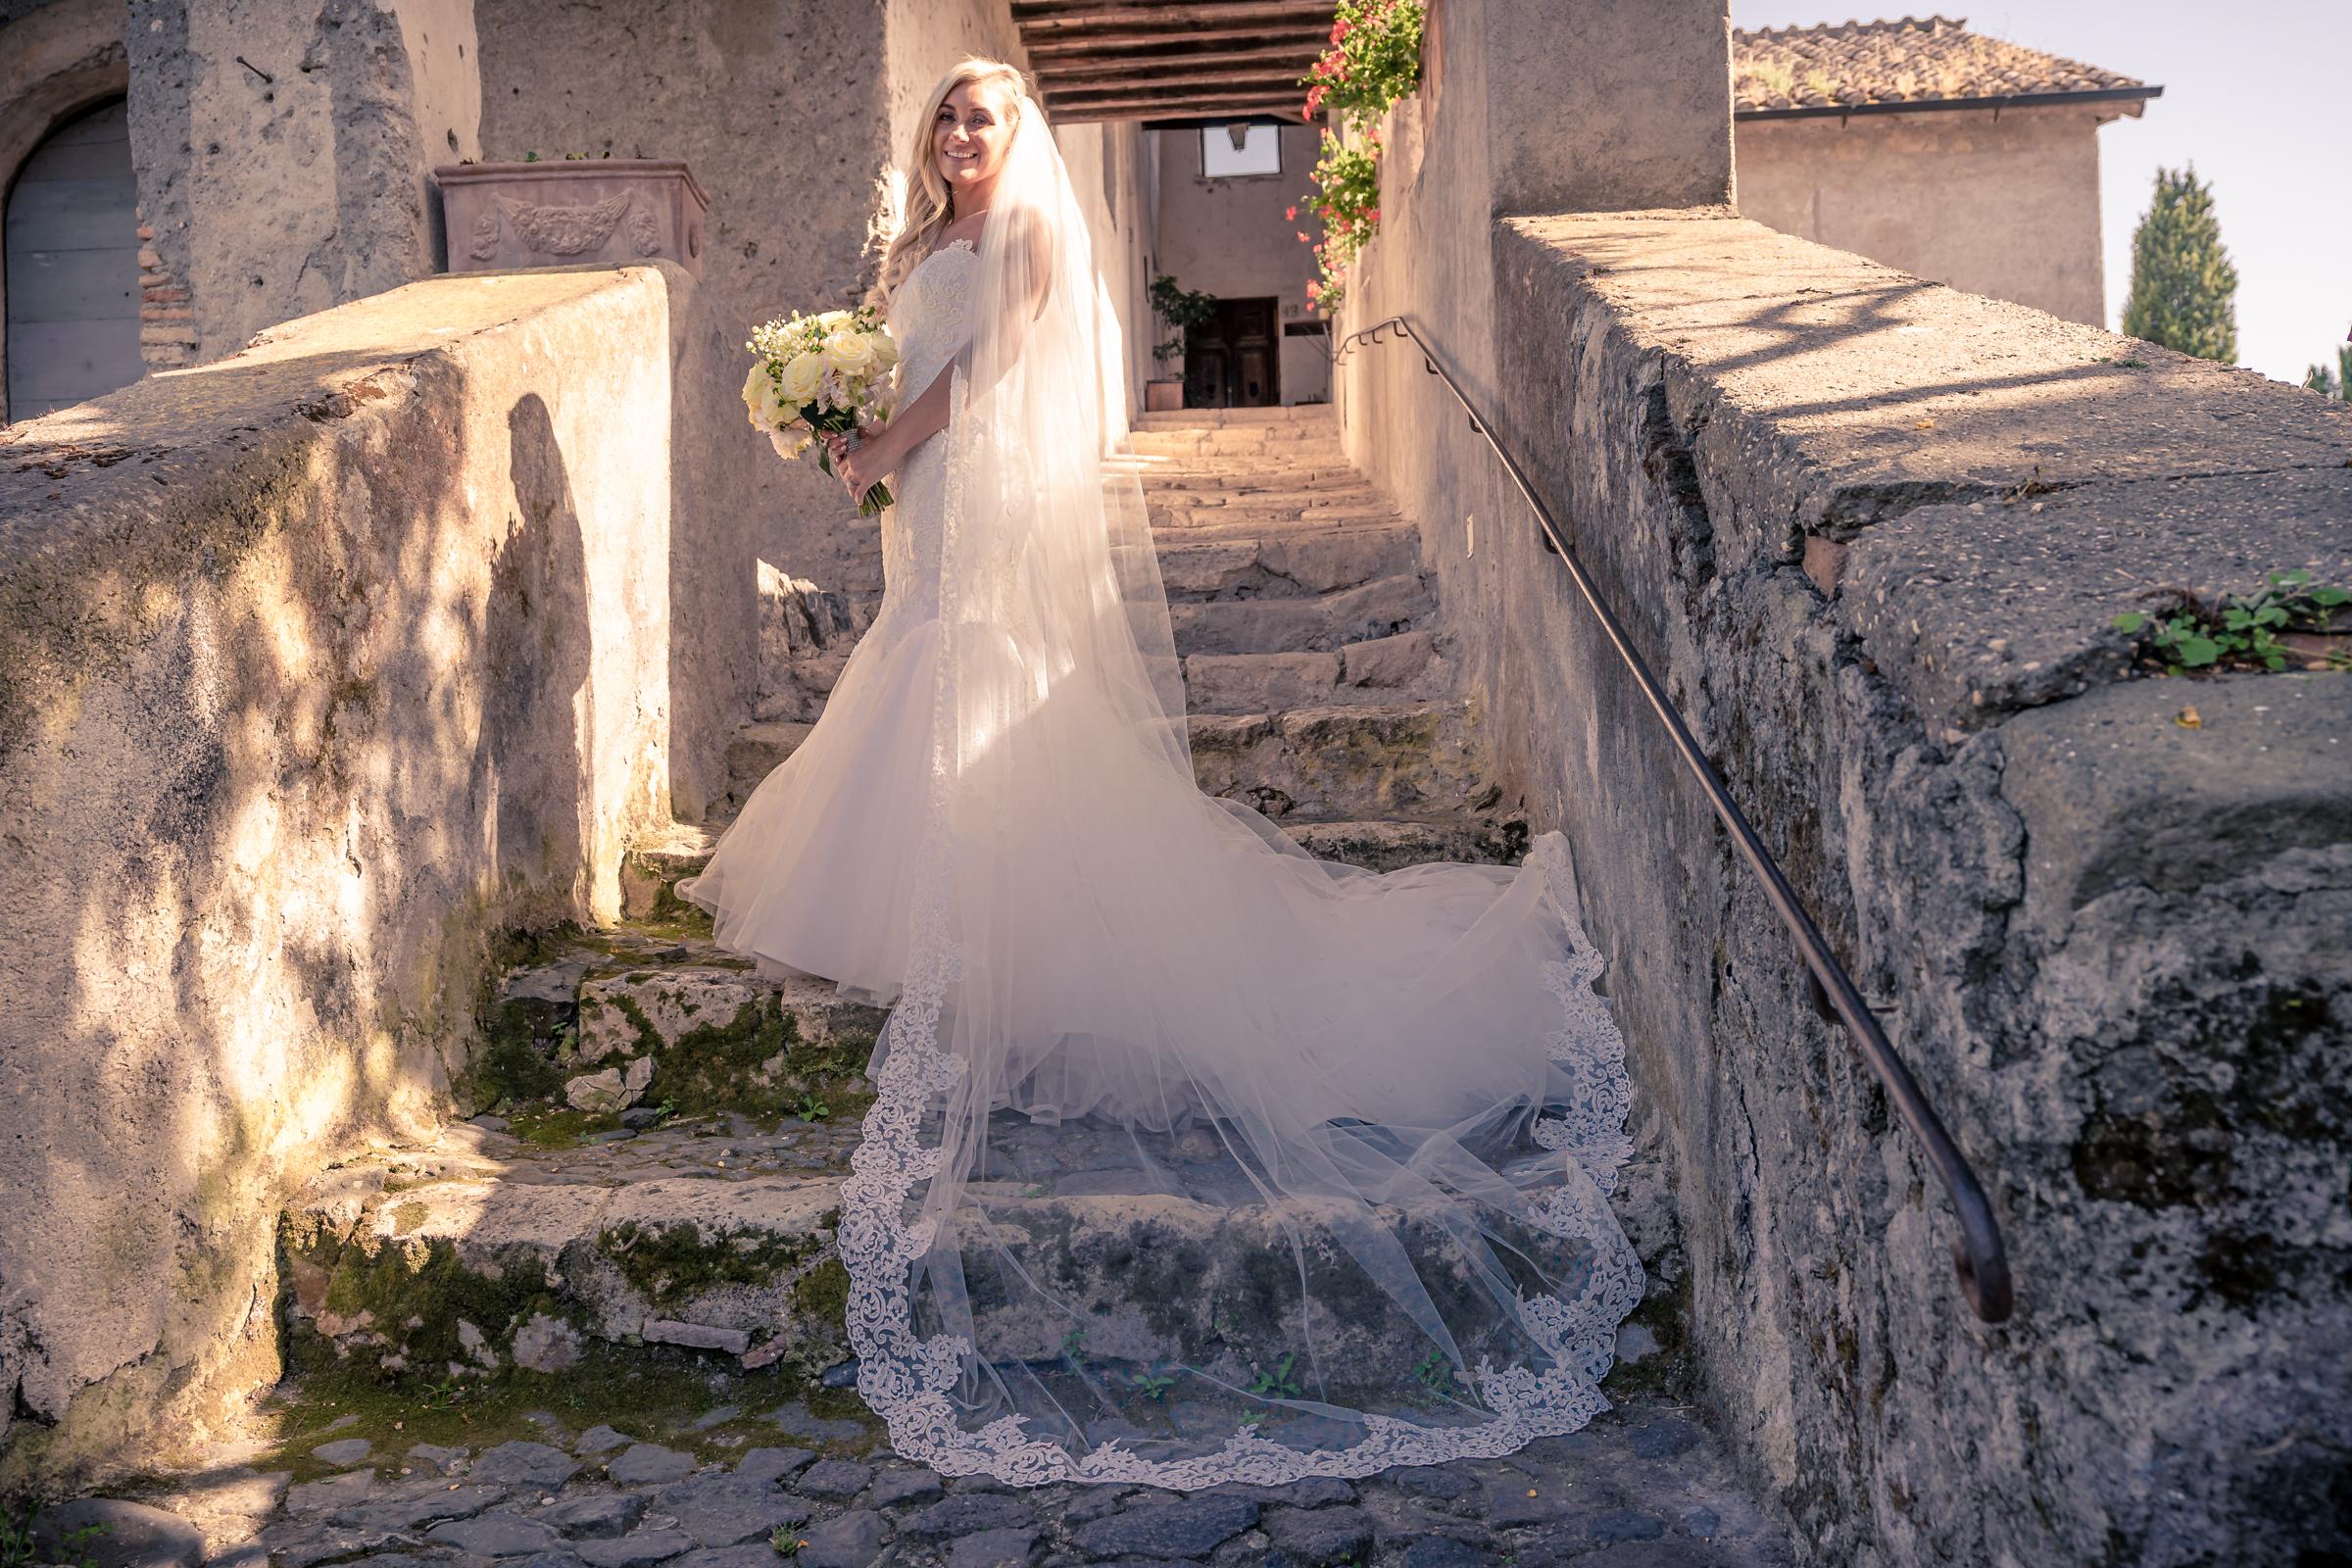 Borgo di tragliata Wedding-28.jpg